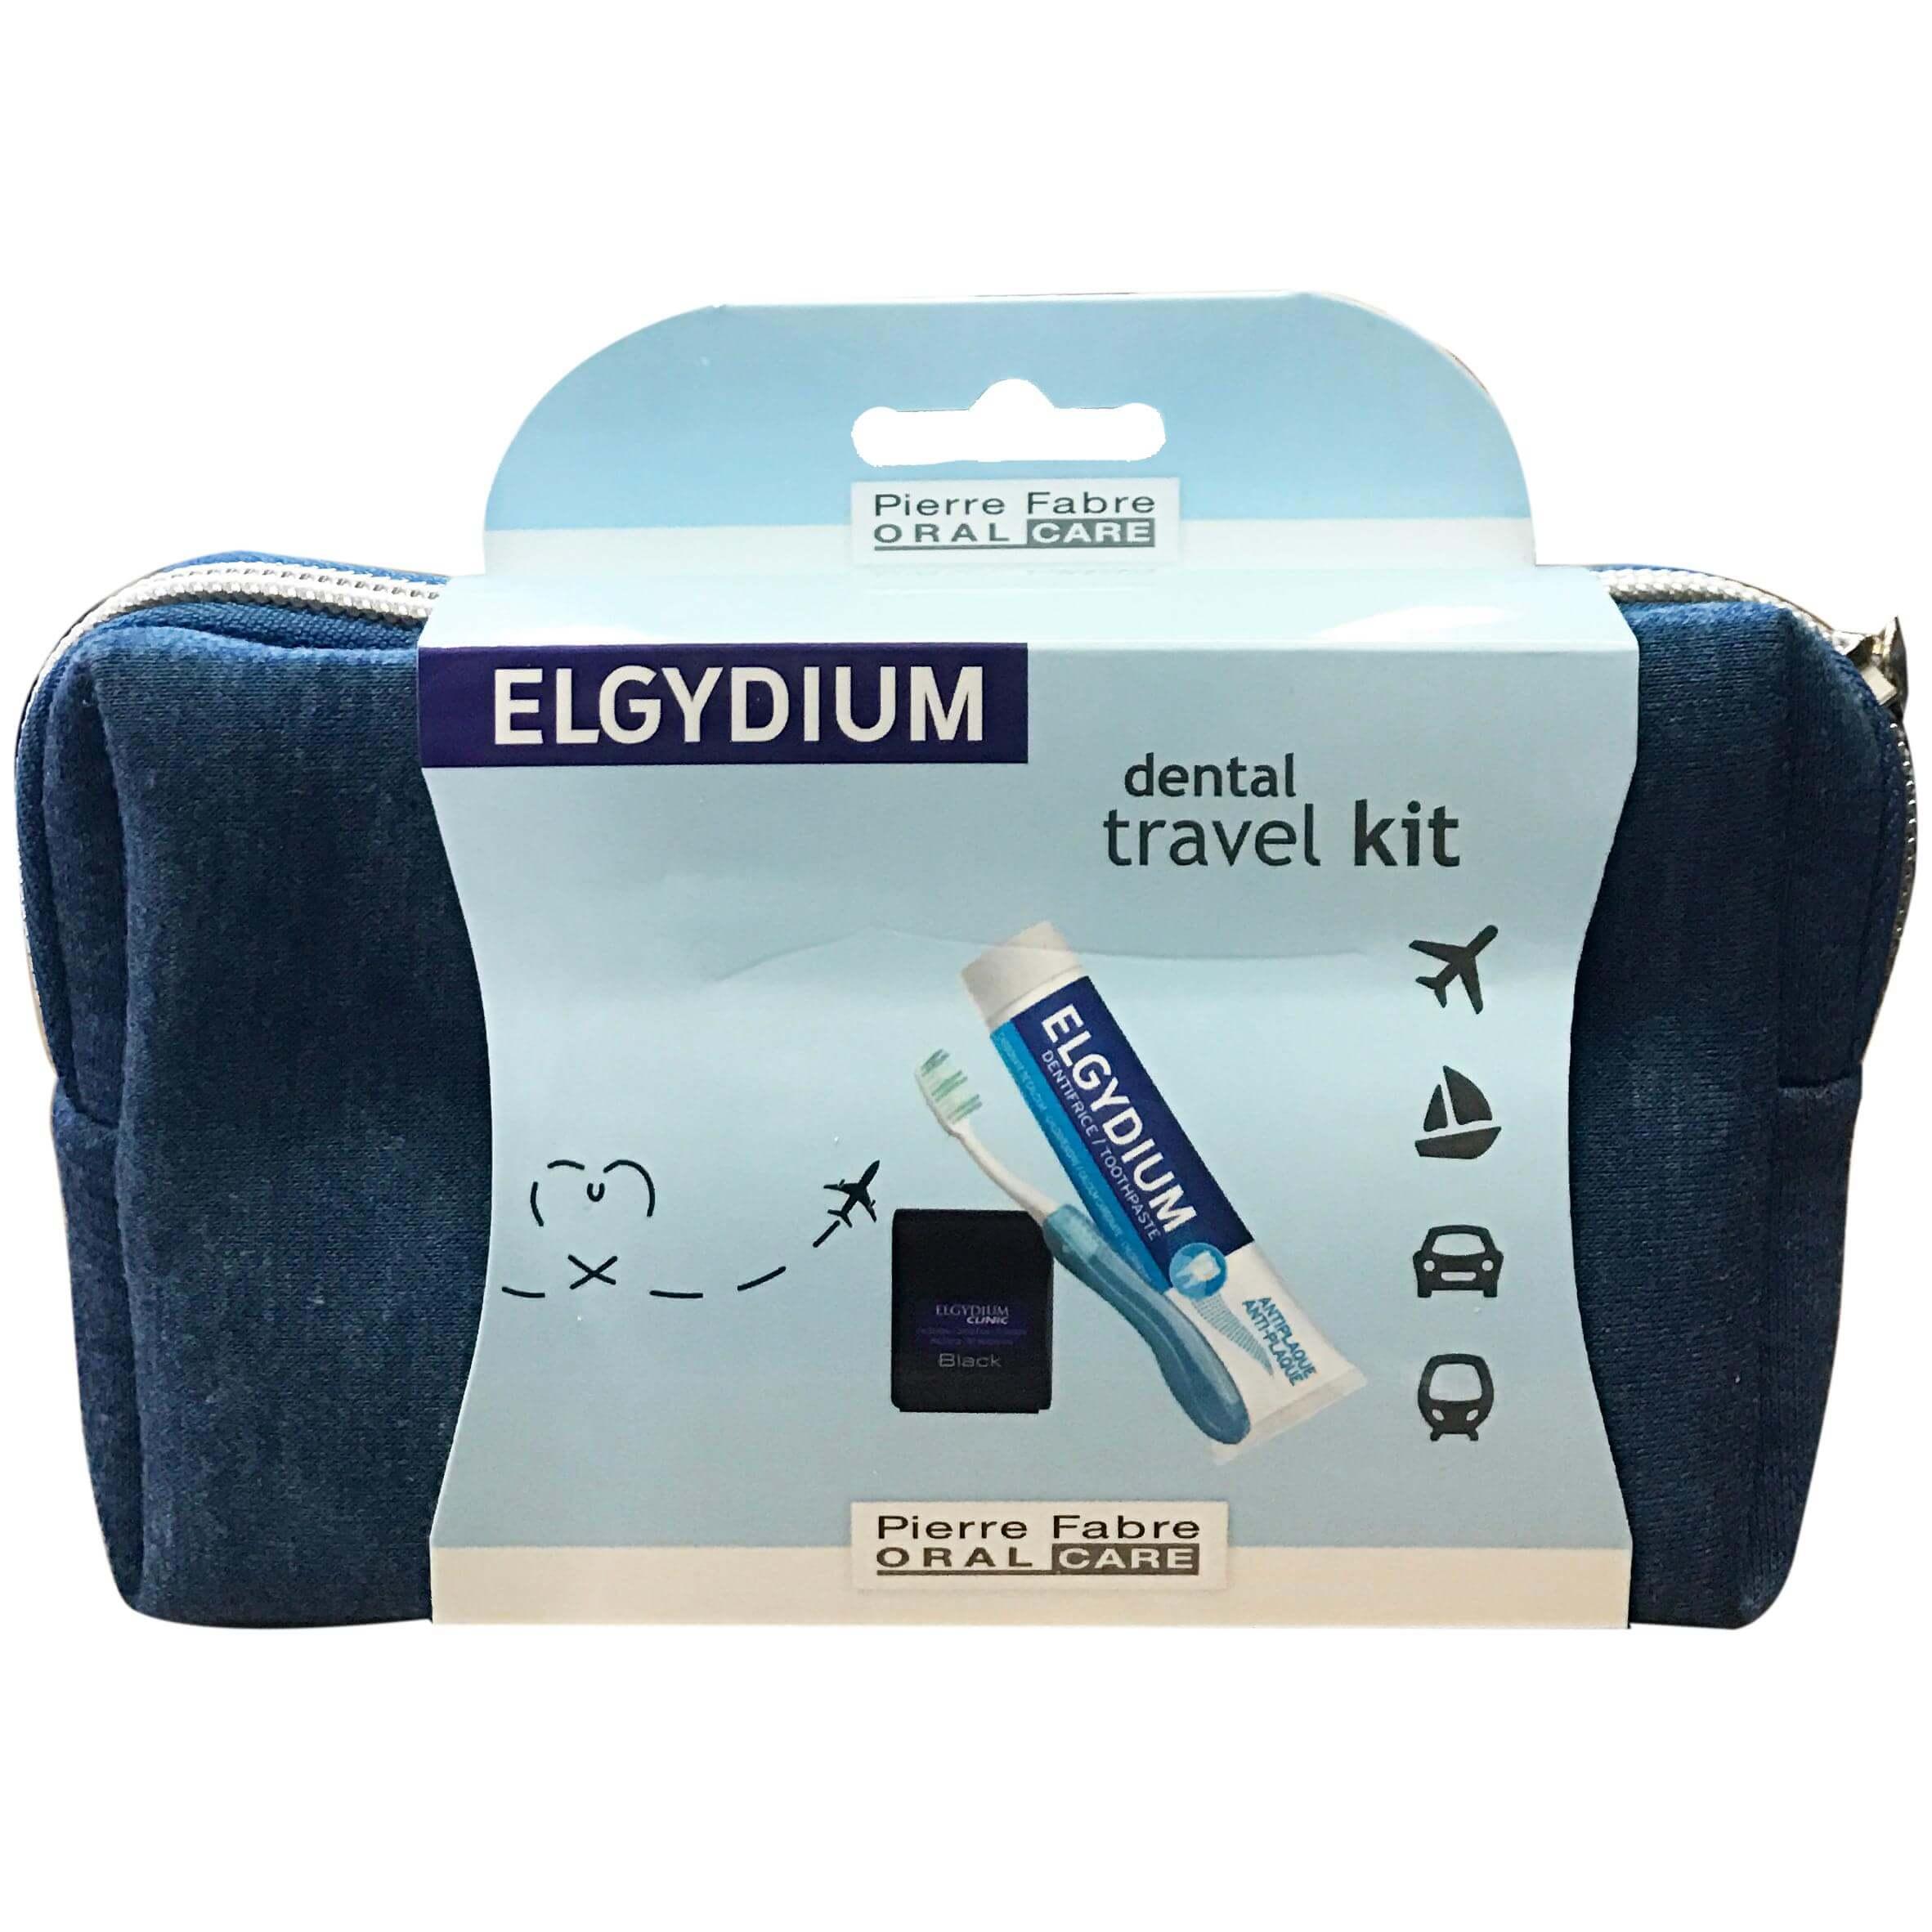 ElgydiumDental Travel Kit Σετ Ταξιδιού με Οδοντόβουρτσα, Οδοντόκρεμα, Οδοντικό Νήμα &Νεσεσέρ σε ΜπλεΧρώμα